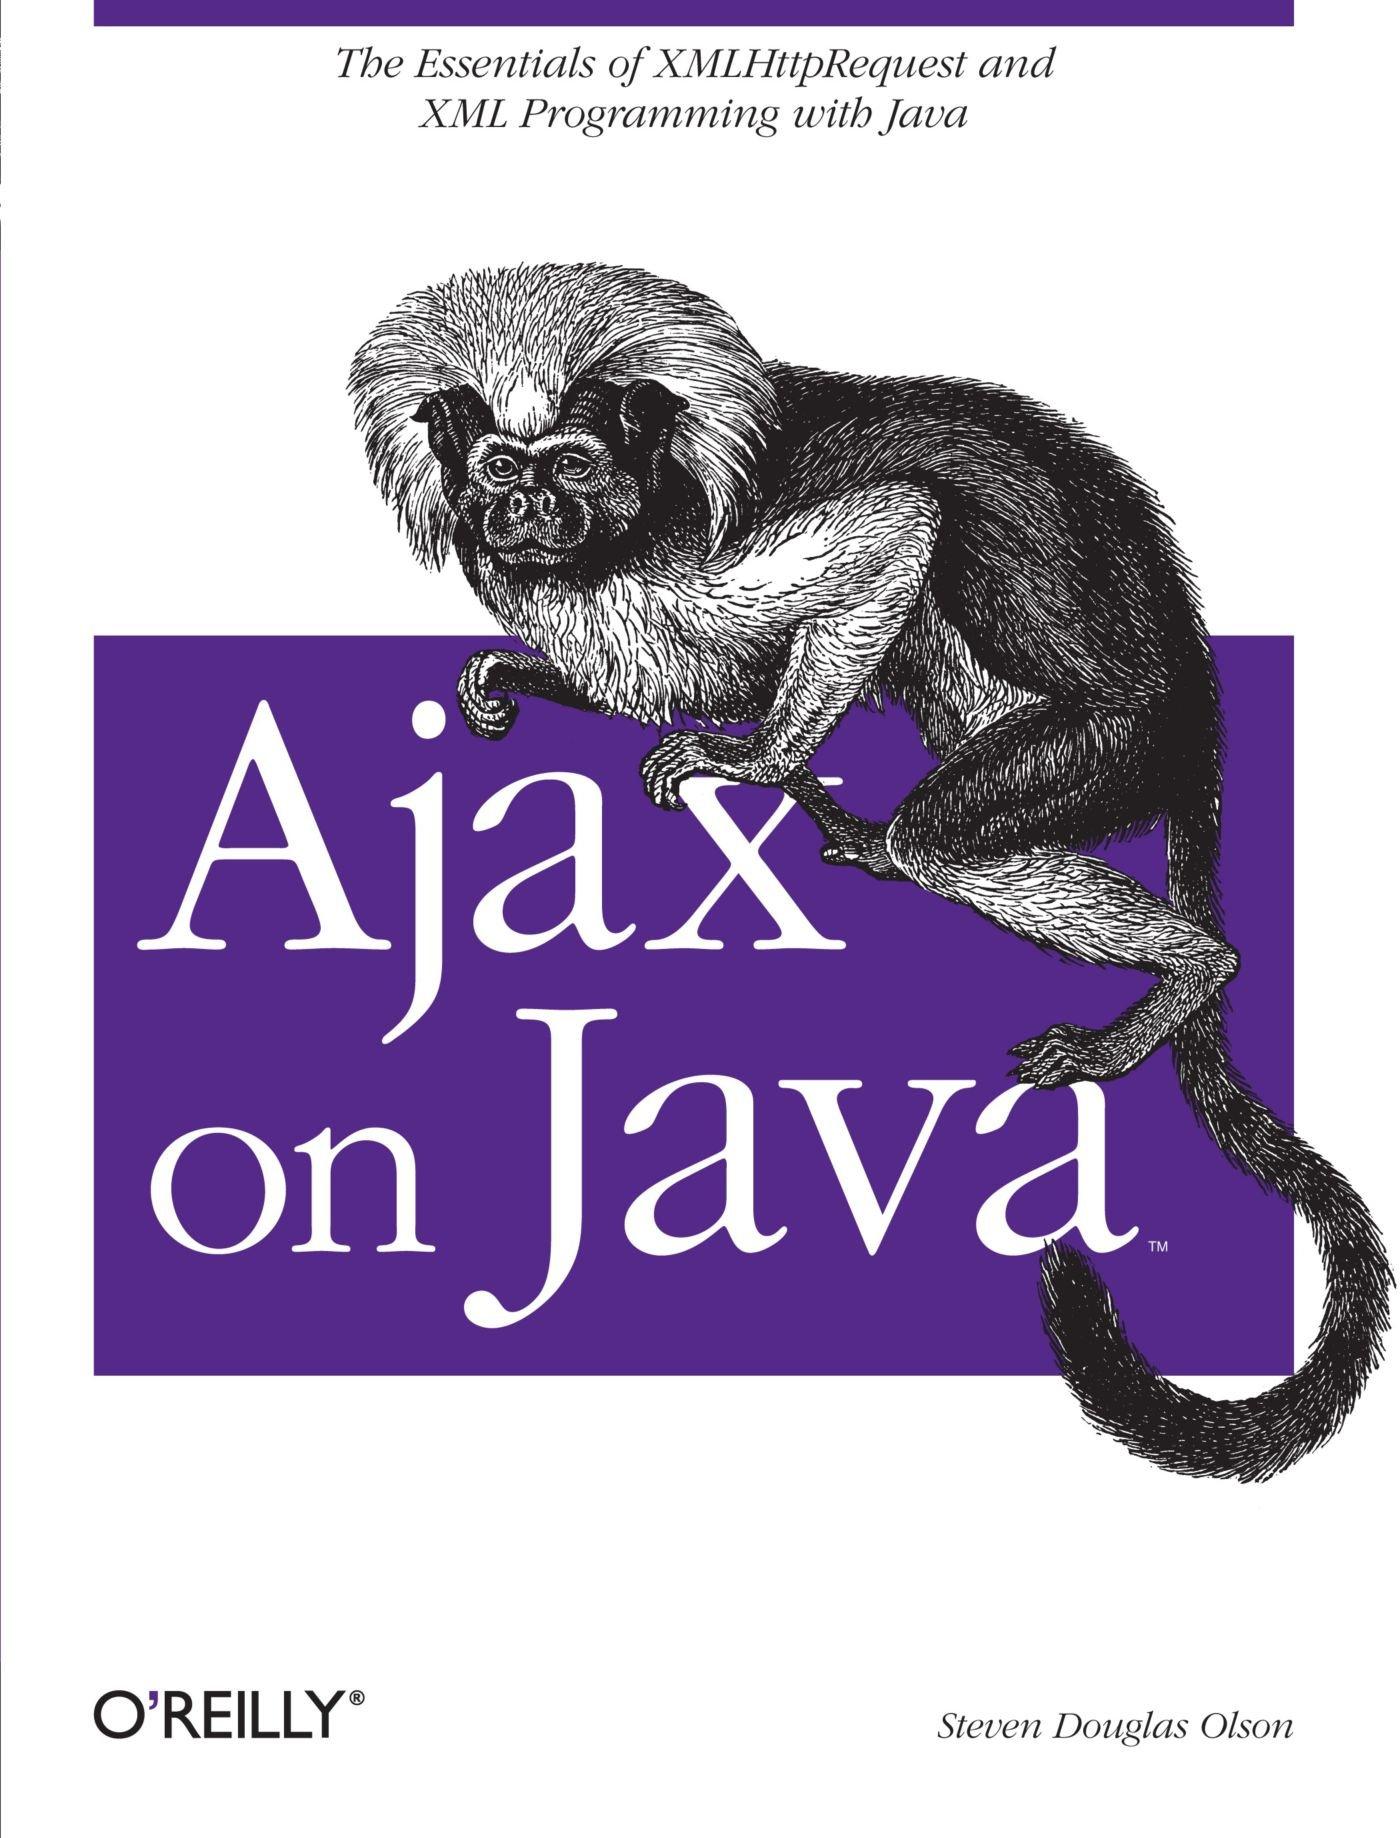 Ajax on Java: Amazon.es: Steven Douglas Olson: Libros en idiomas extranjeros